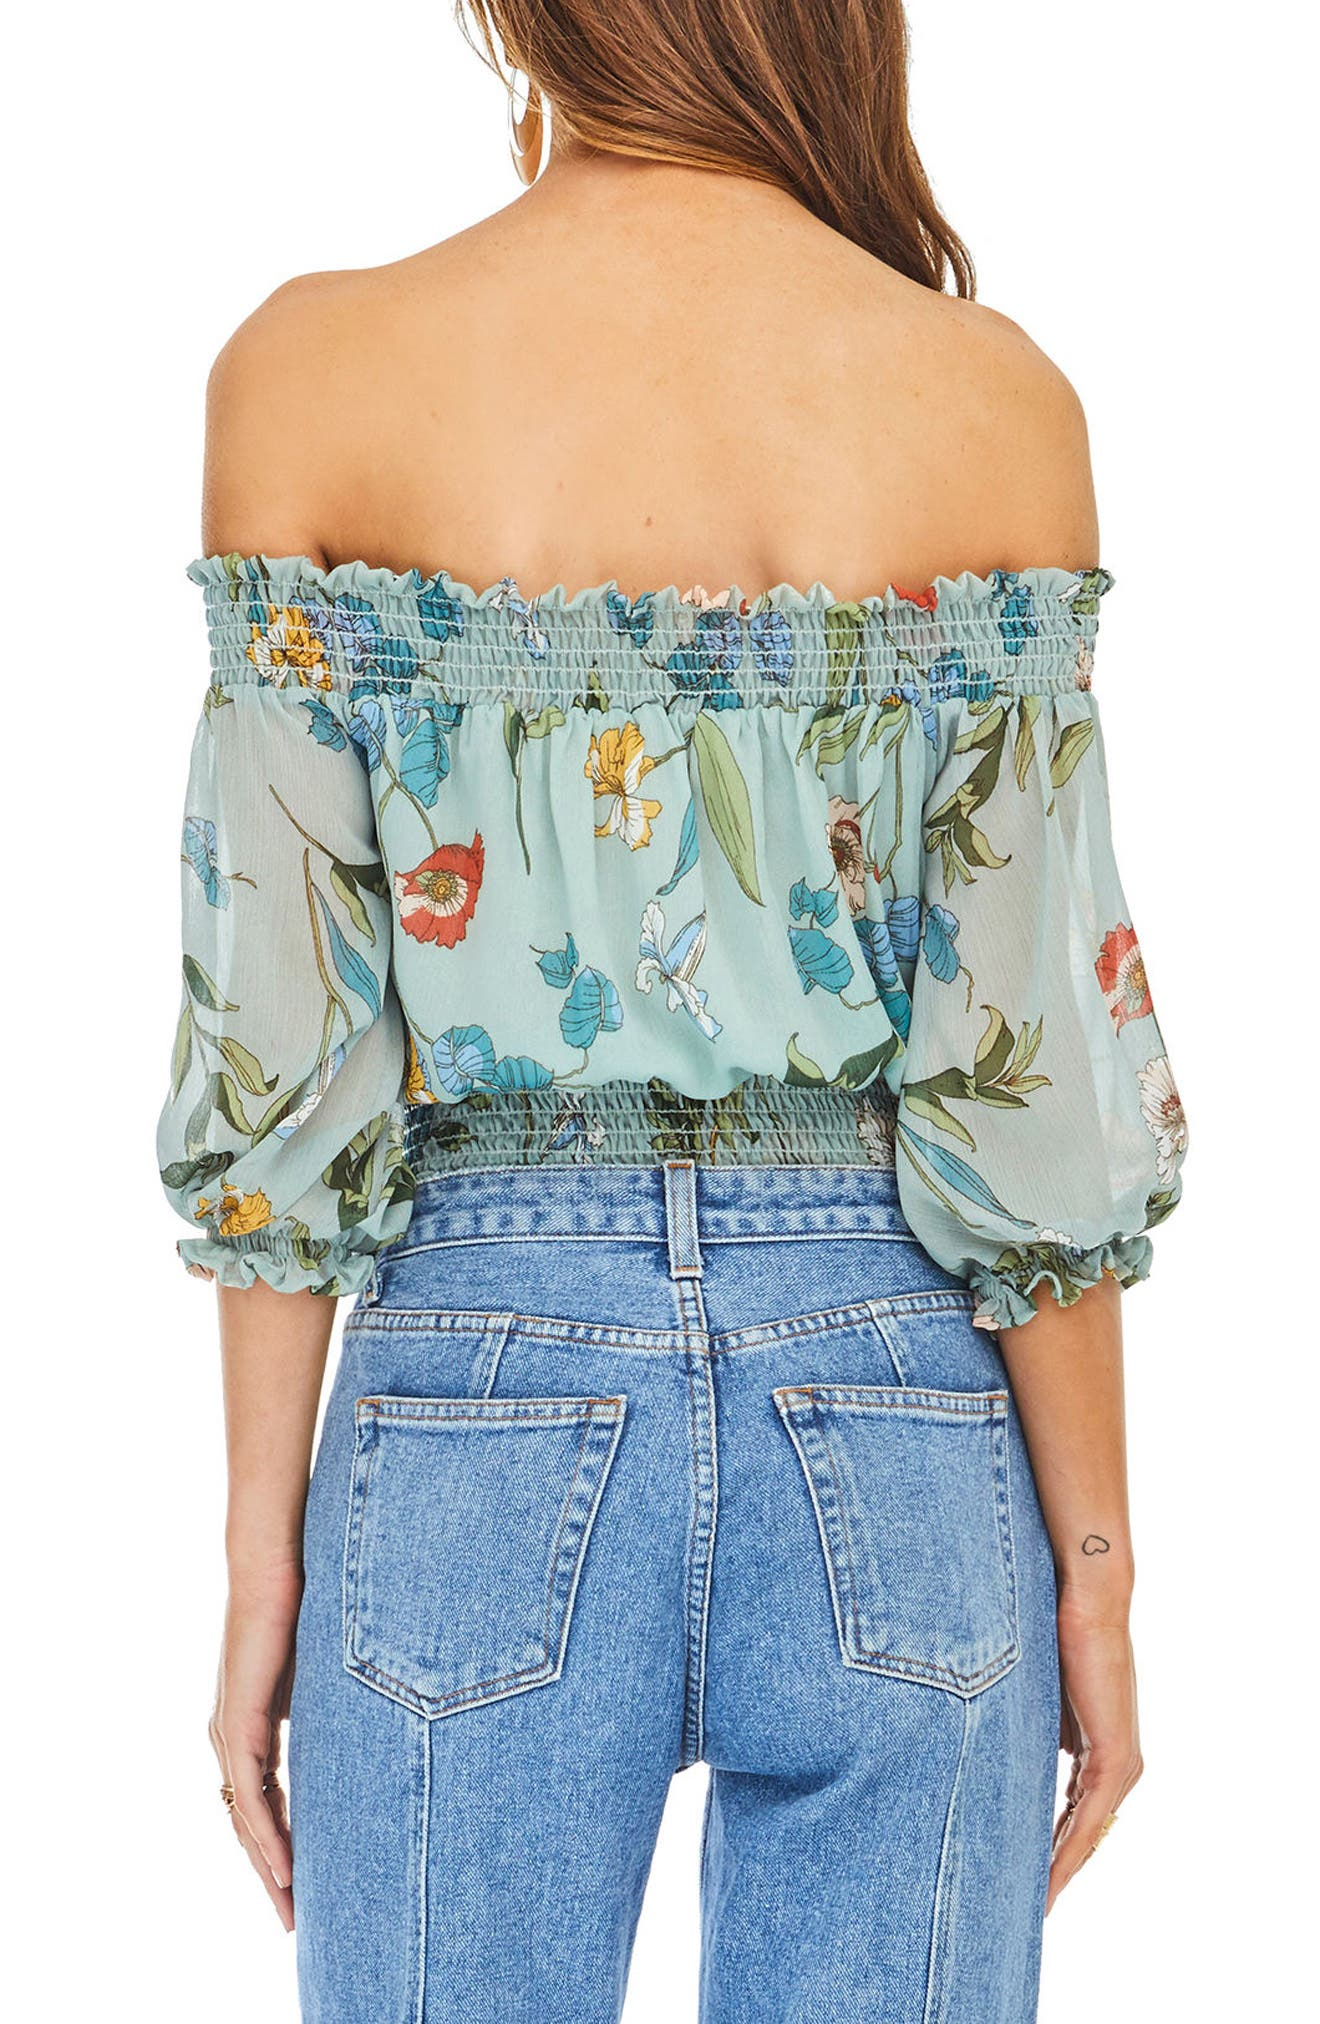 Lucy Off the Shoulder Bodysuit,                             Alternate thumbnail 3, color,                             Sage Multi Floral